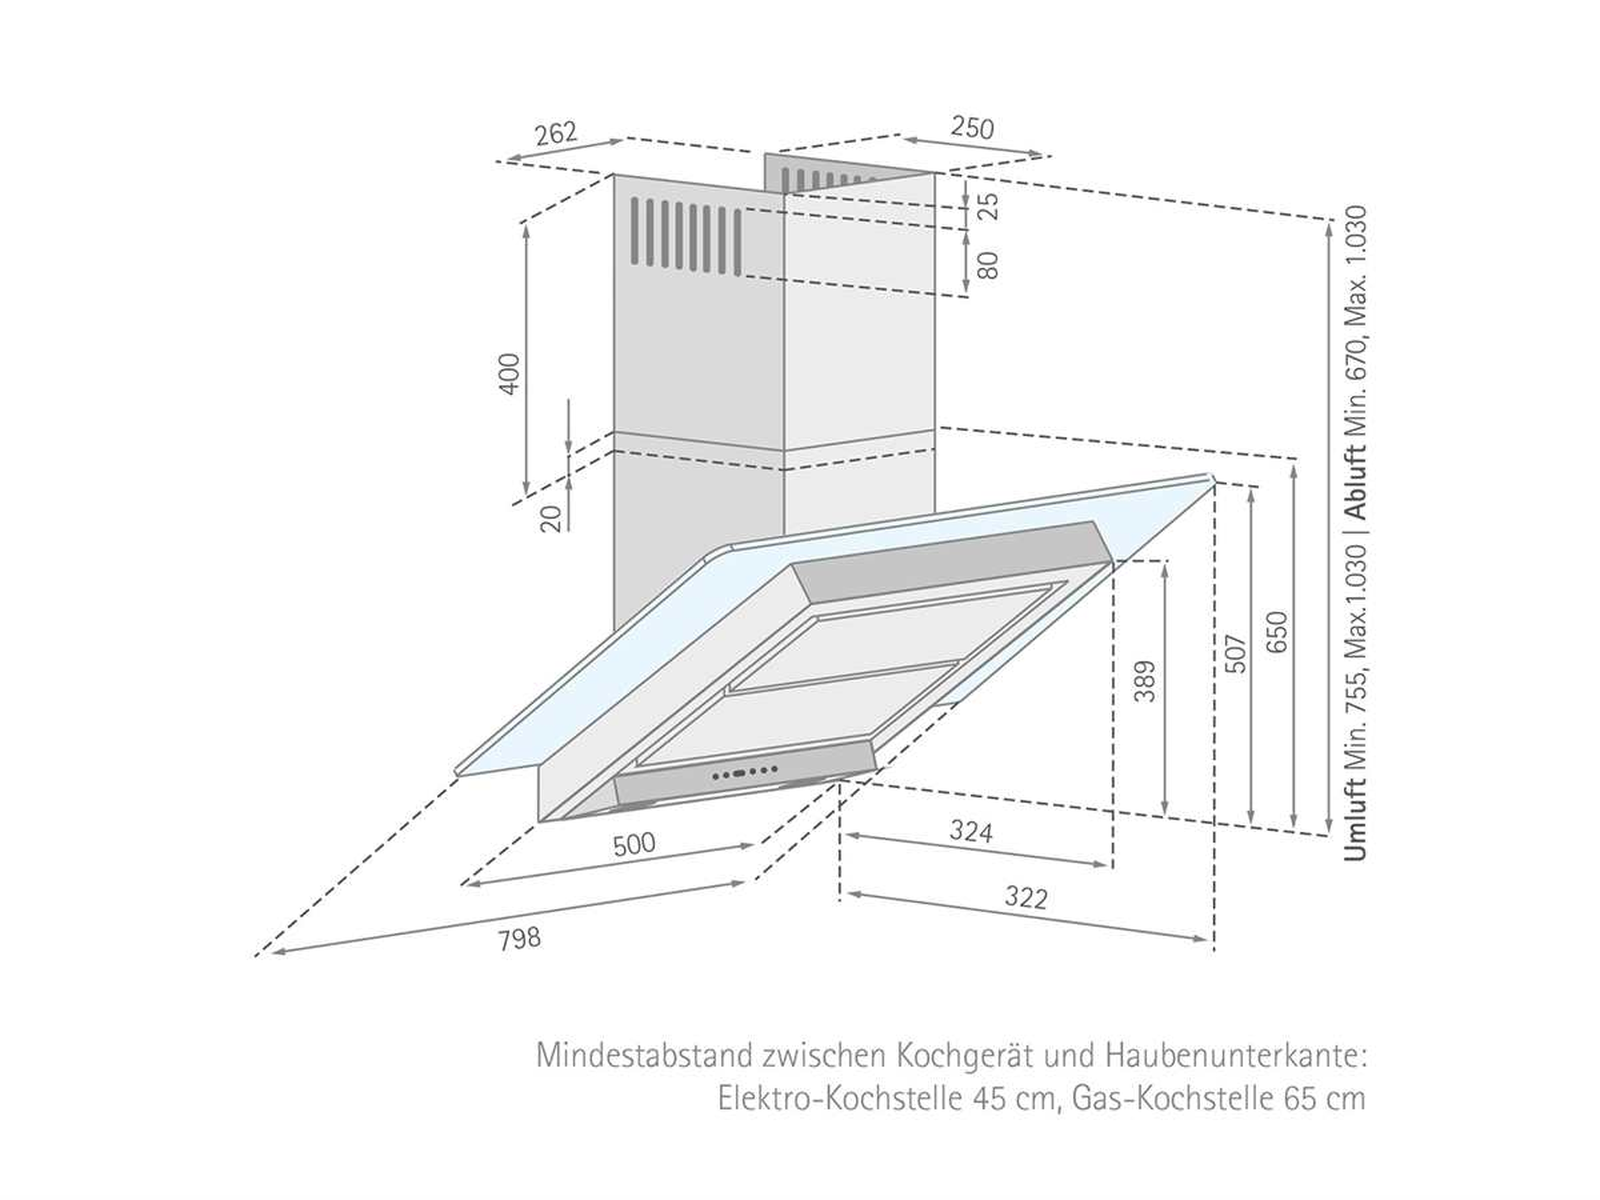 Silverline Perla Deluxe PEW 885.2 ES Kopffreihaube Edelstahl/Sandglas